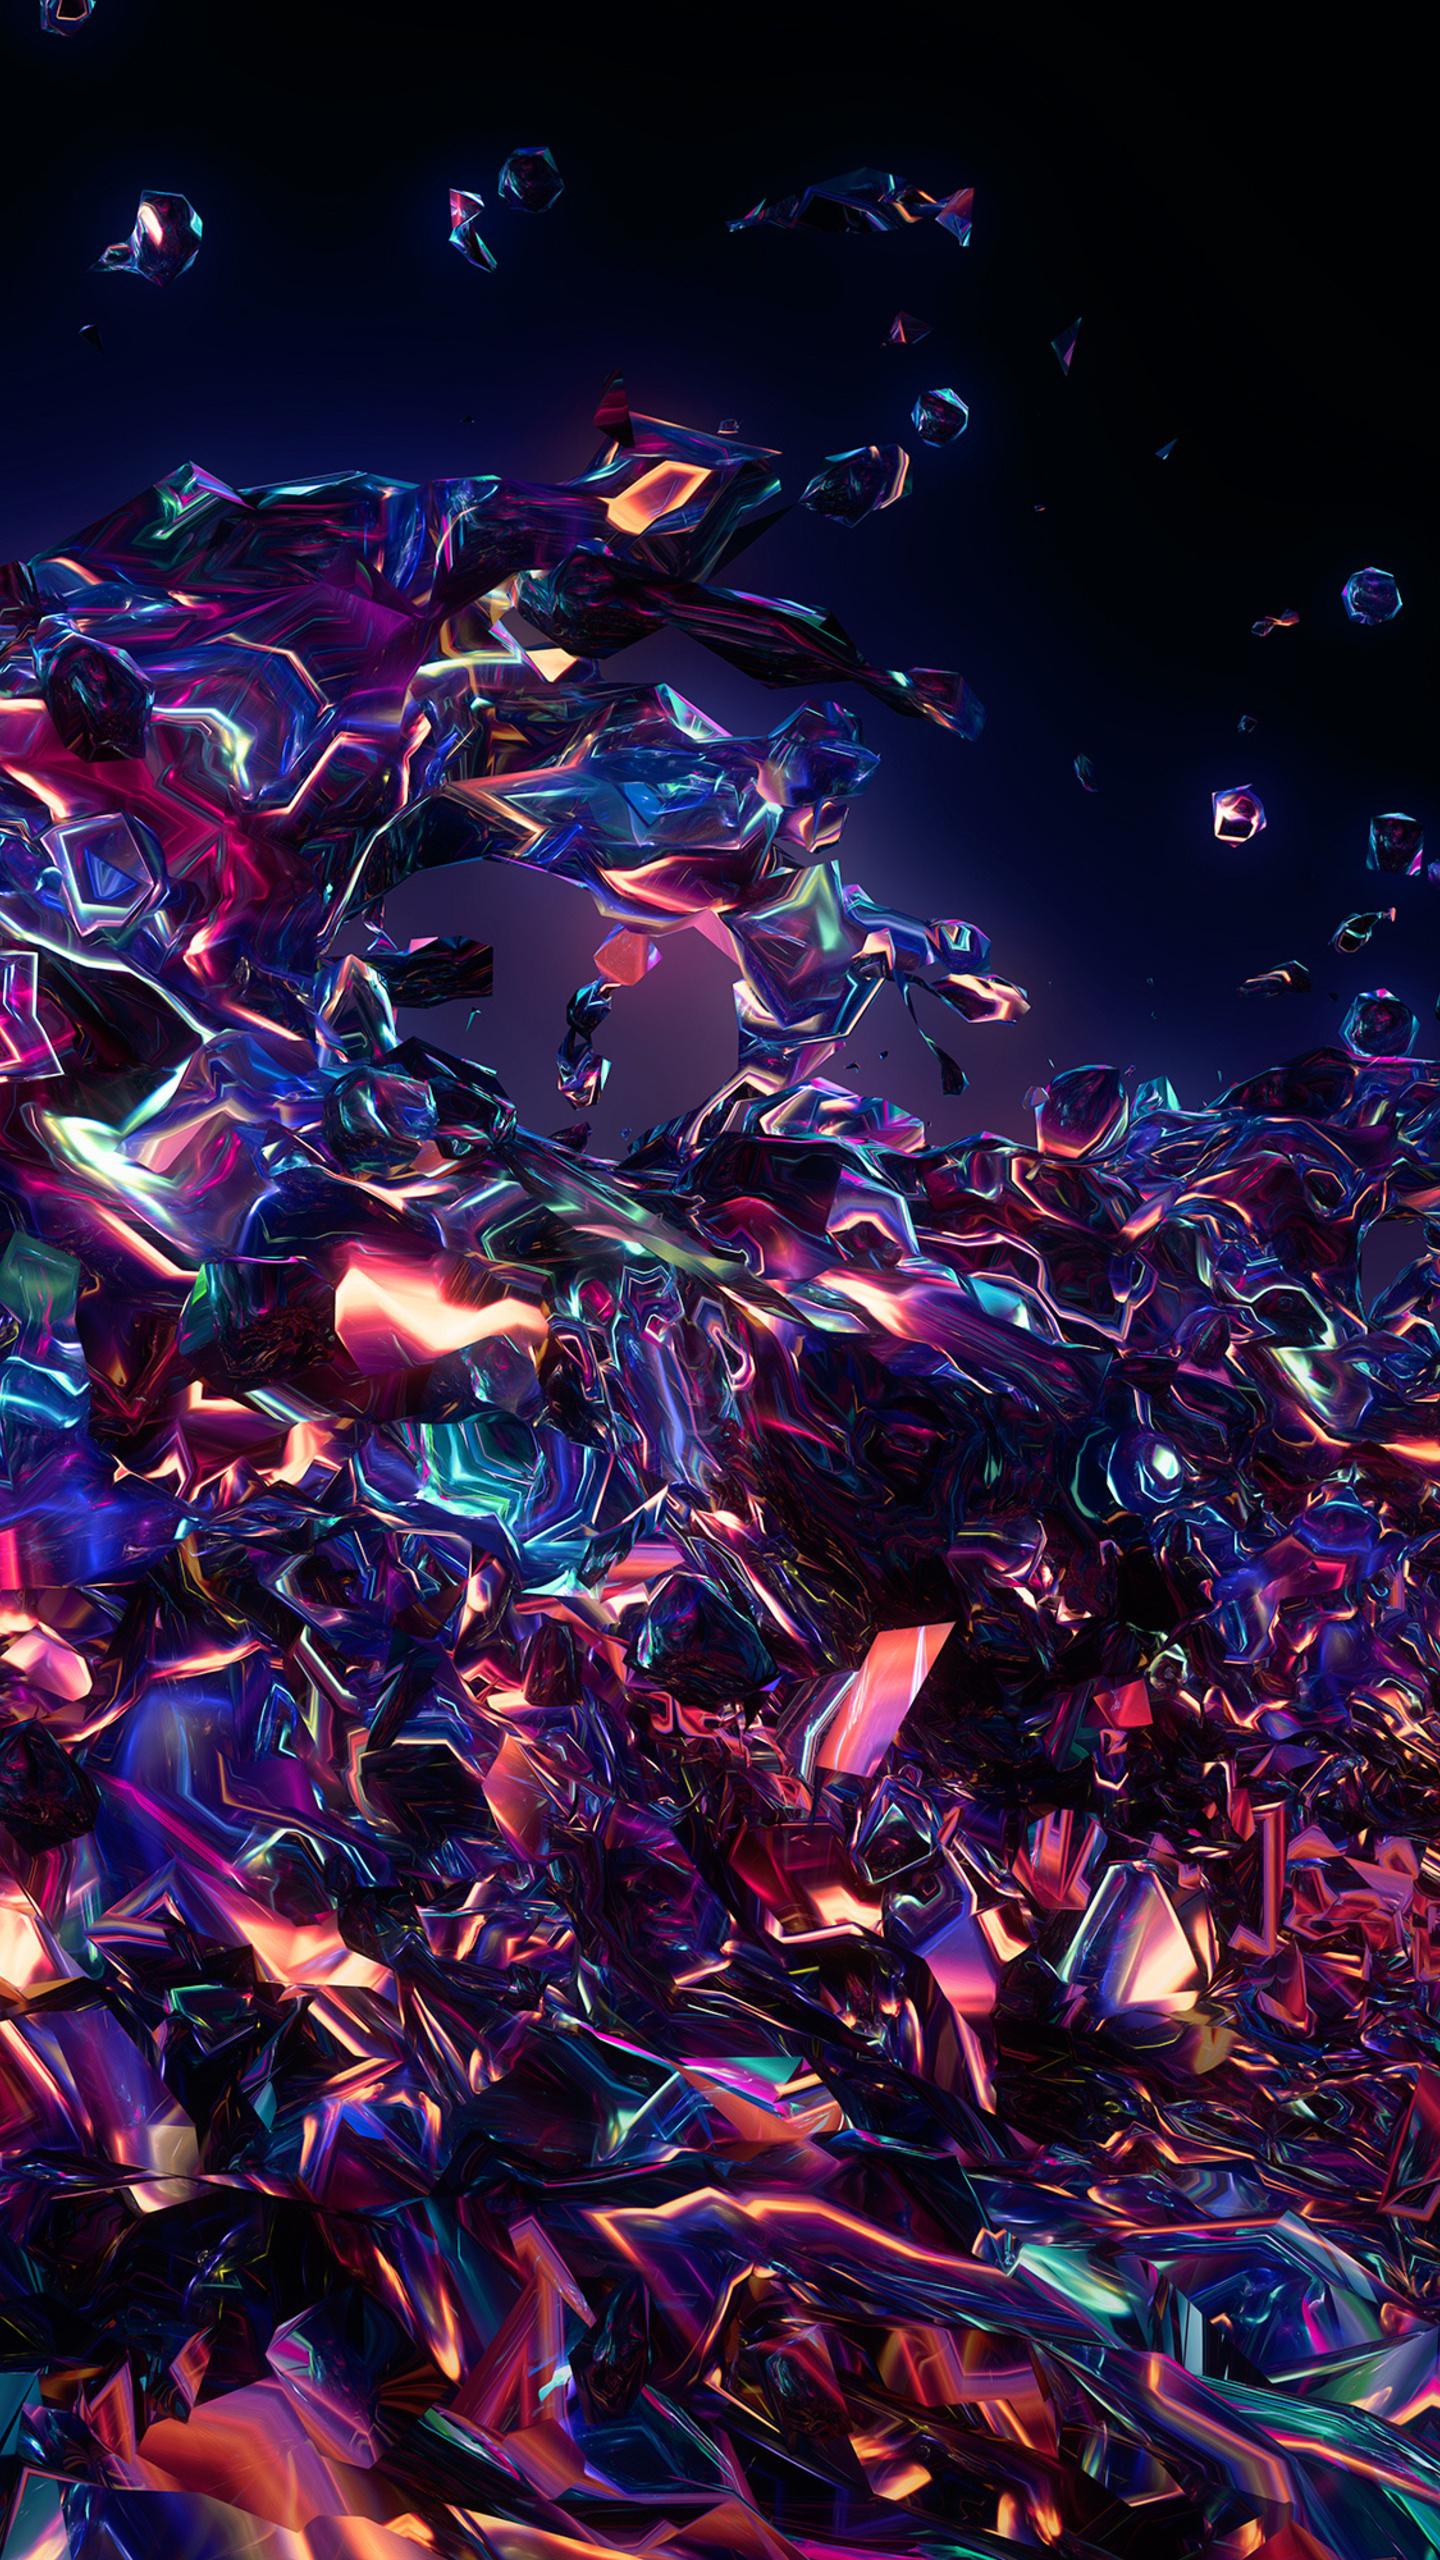 (+14) 1440x2560 Wallpaper Abstract Full HD